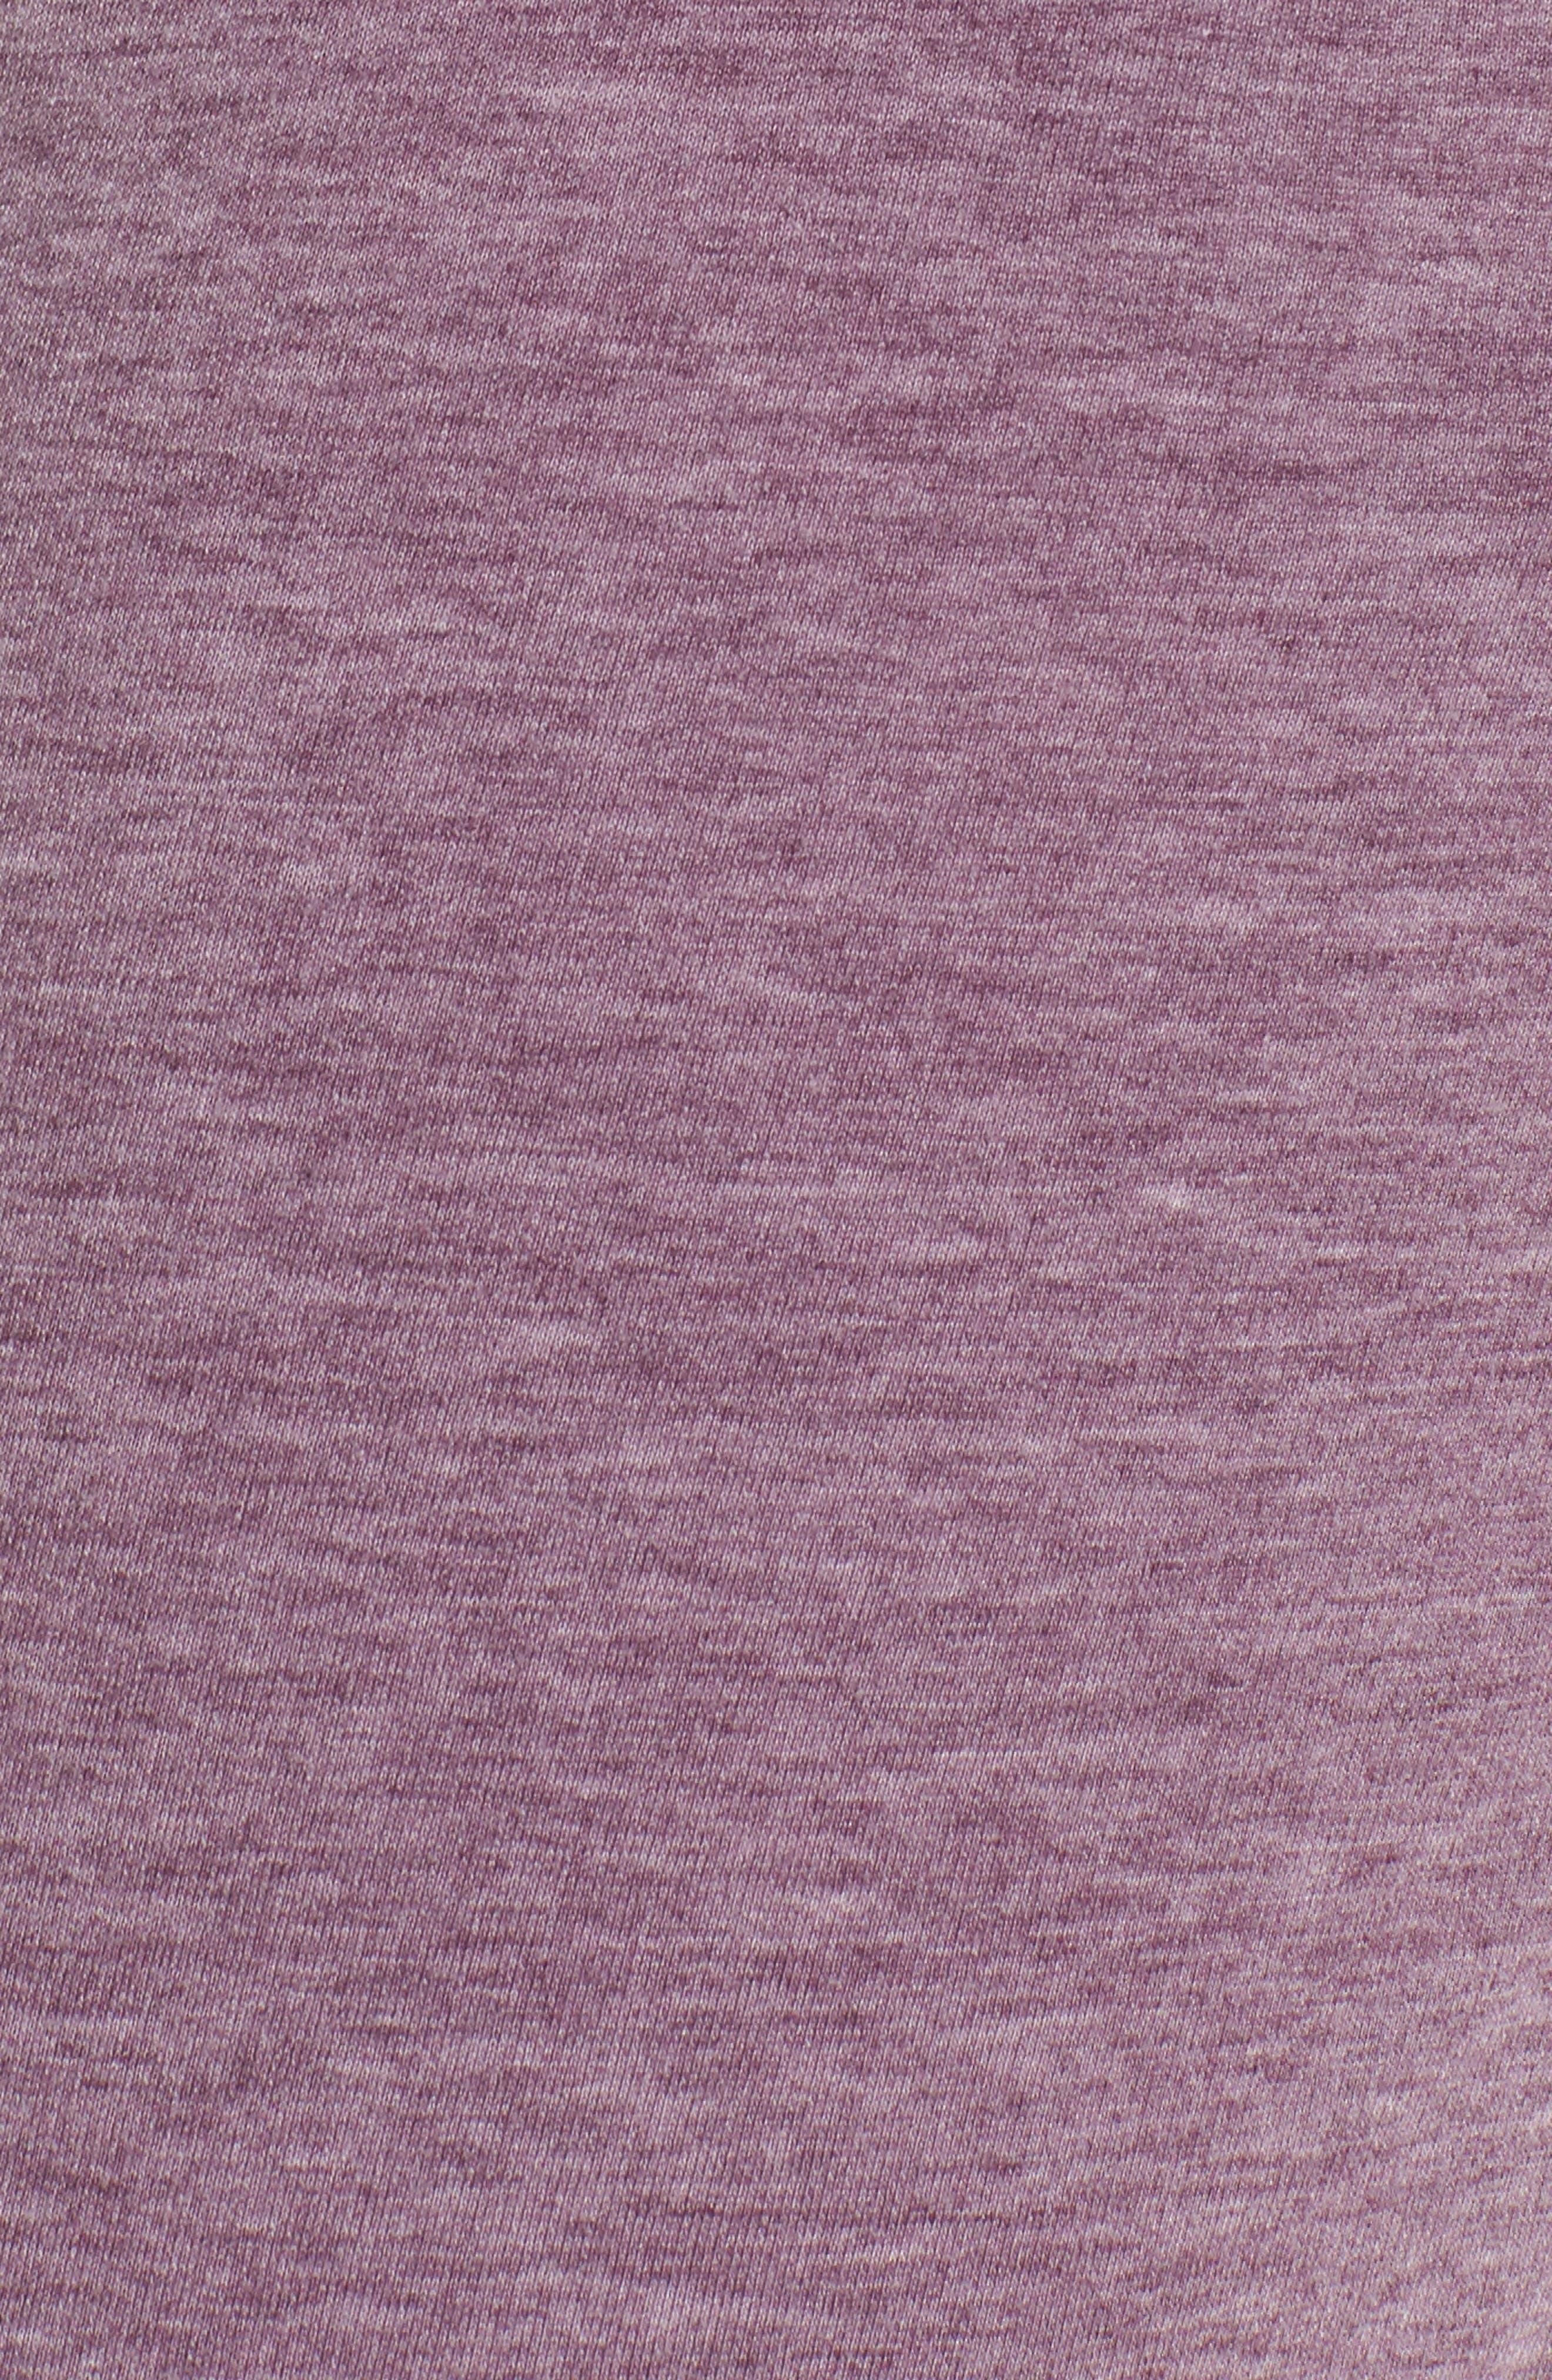 Kayle Crop Sweatpants,                             Alternate thumbnail 5, color,                             Aubergine Glow